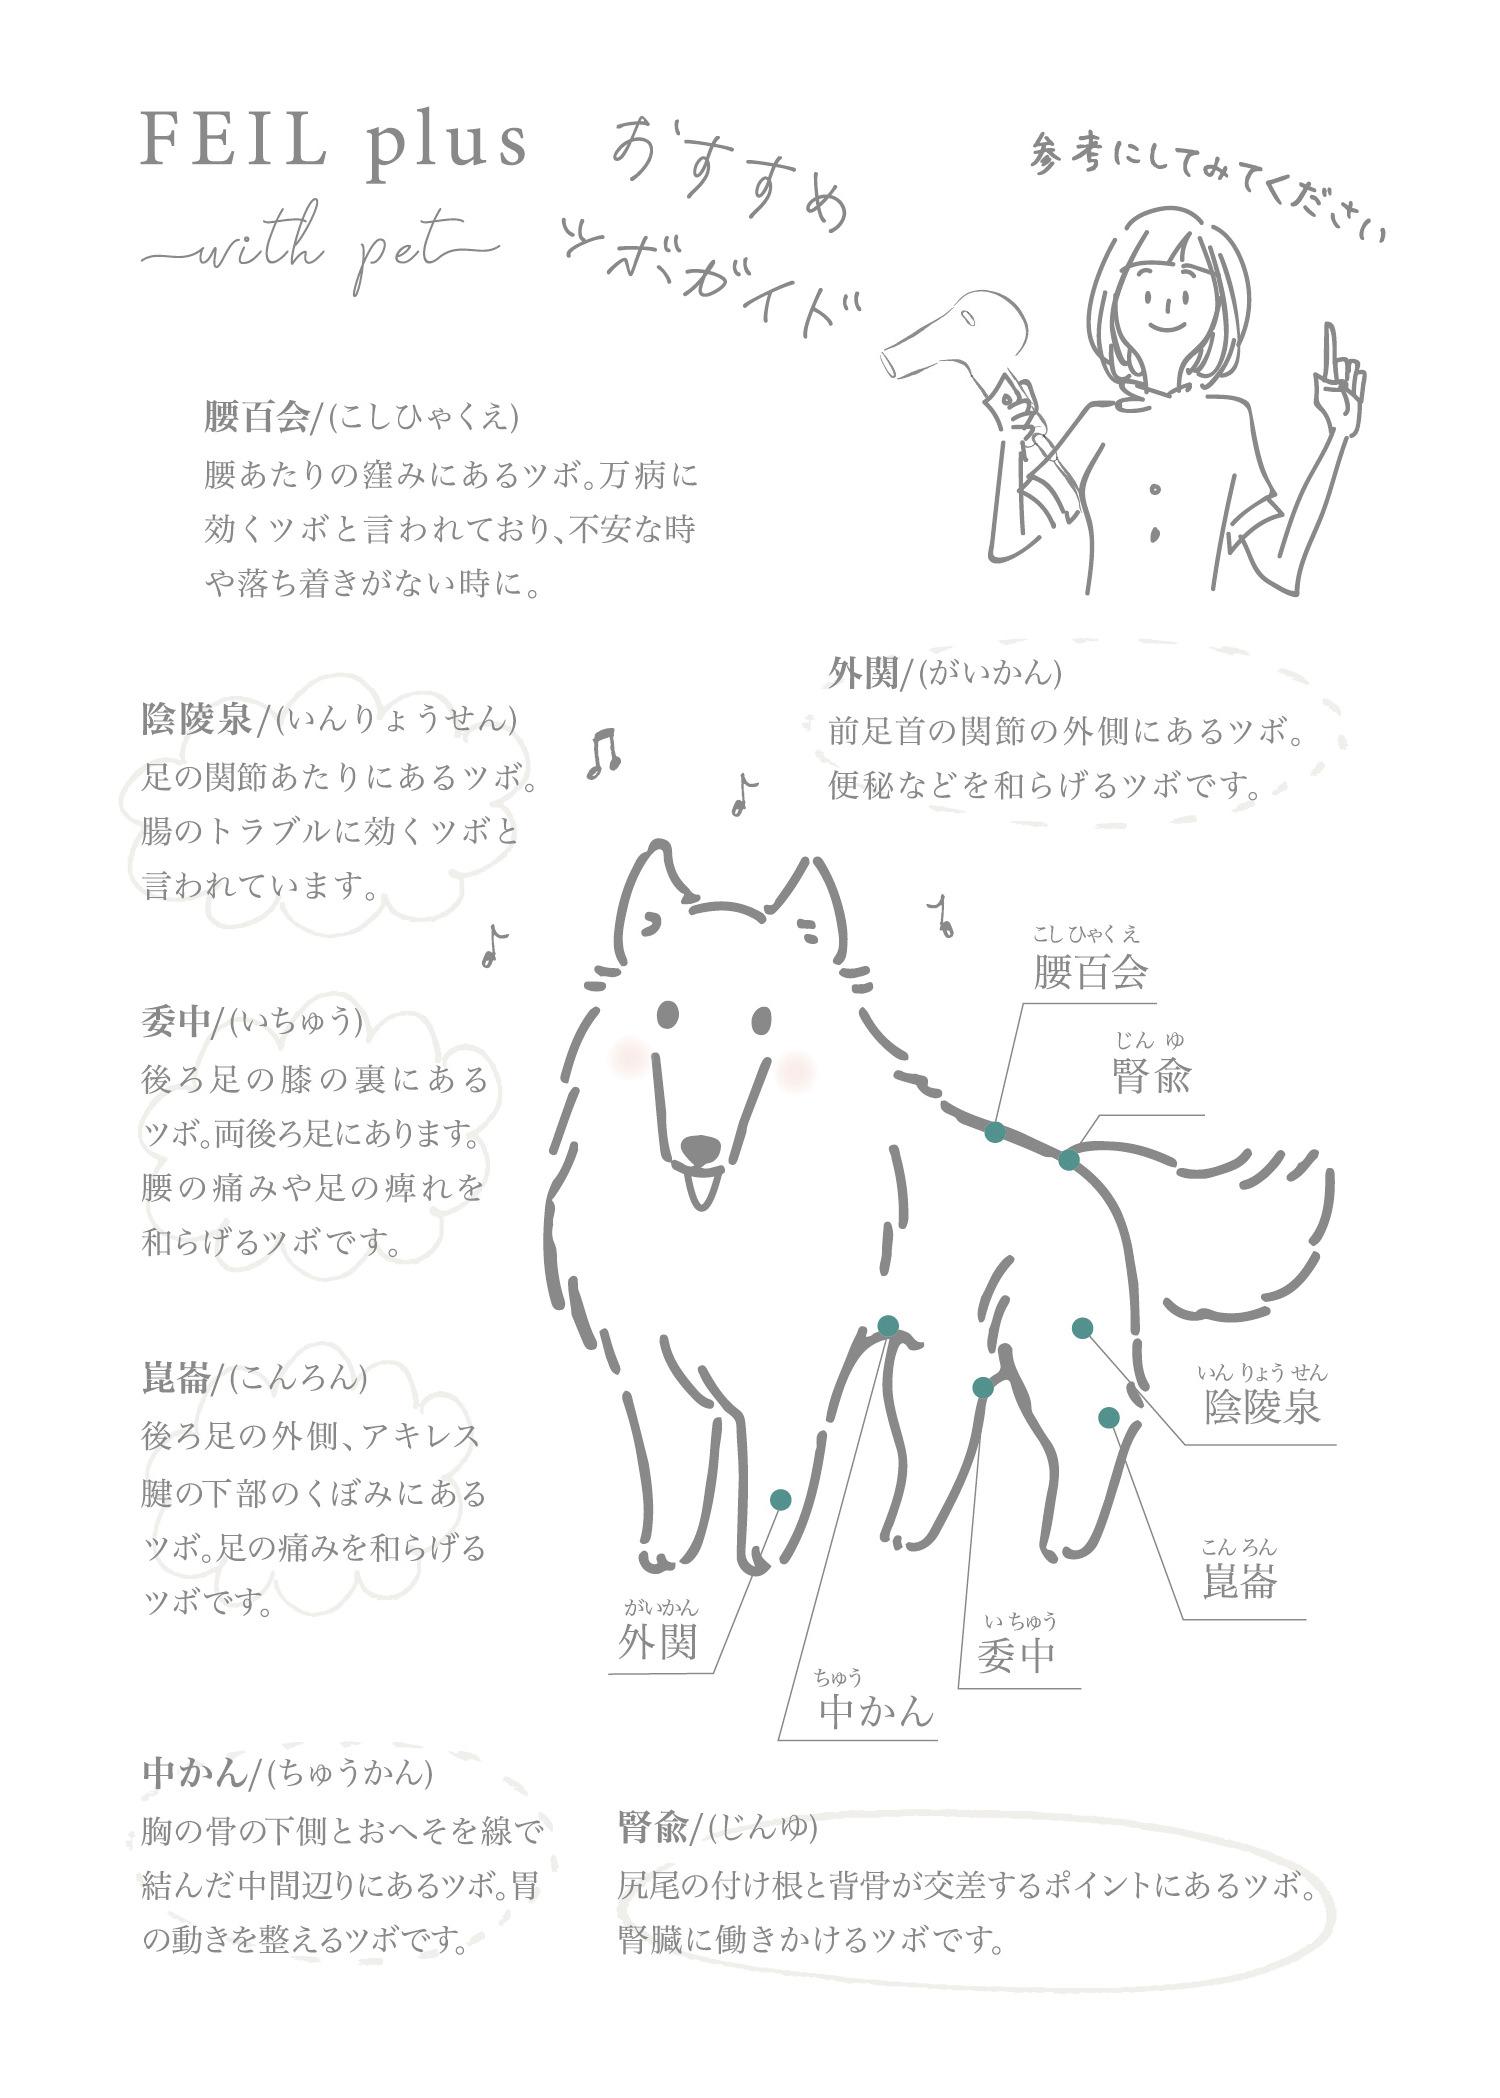 FEIL plus with pet おすすめツボガイド